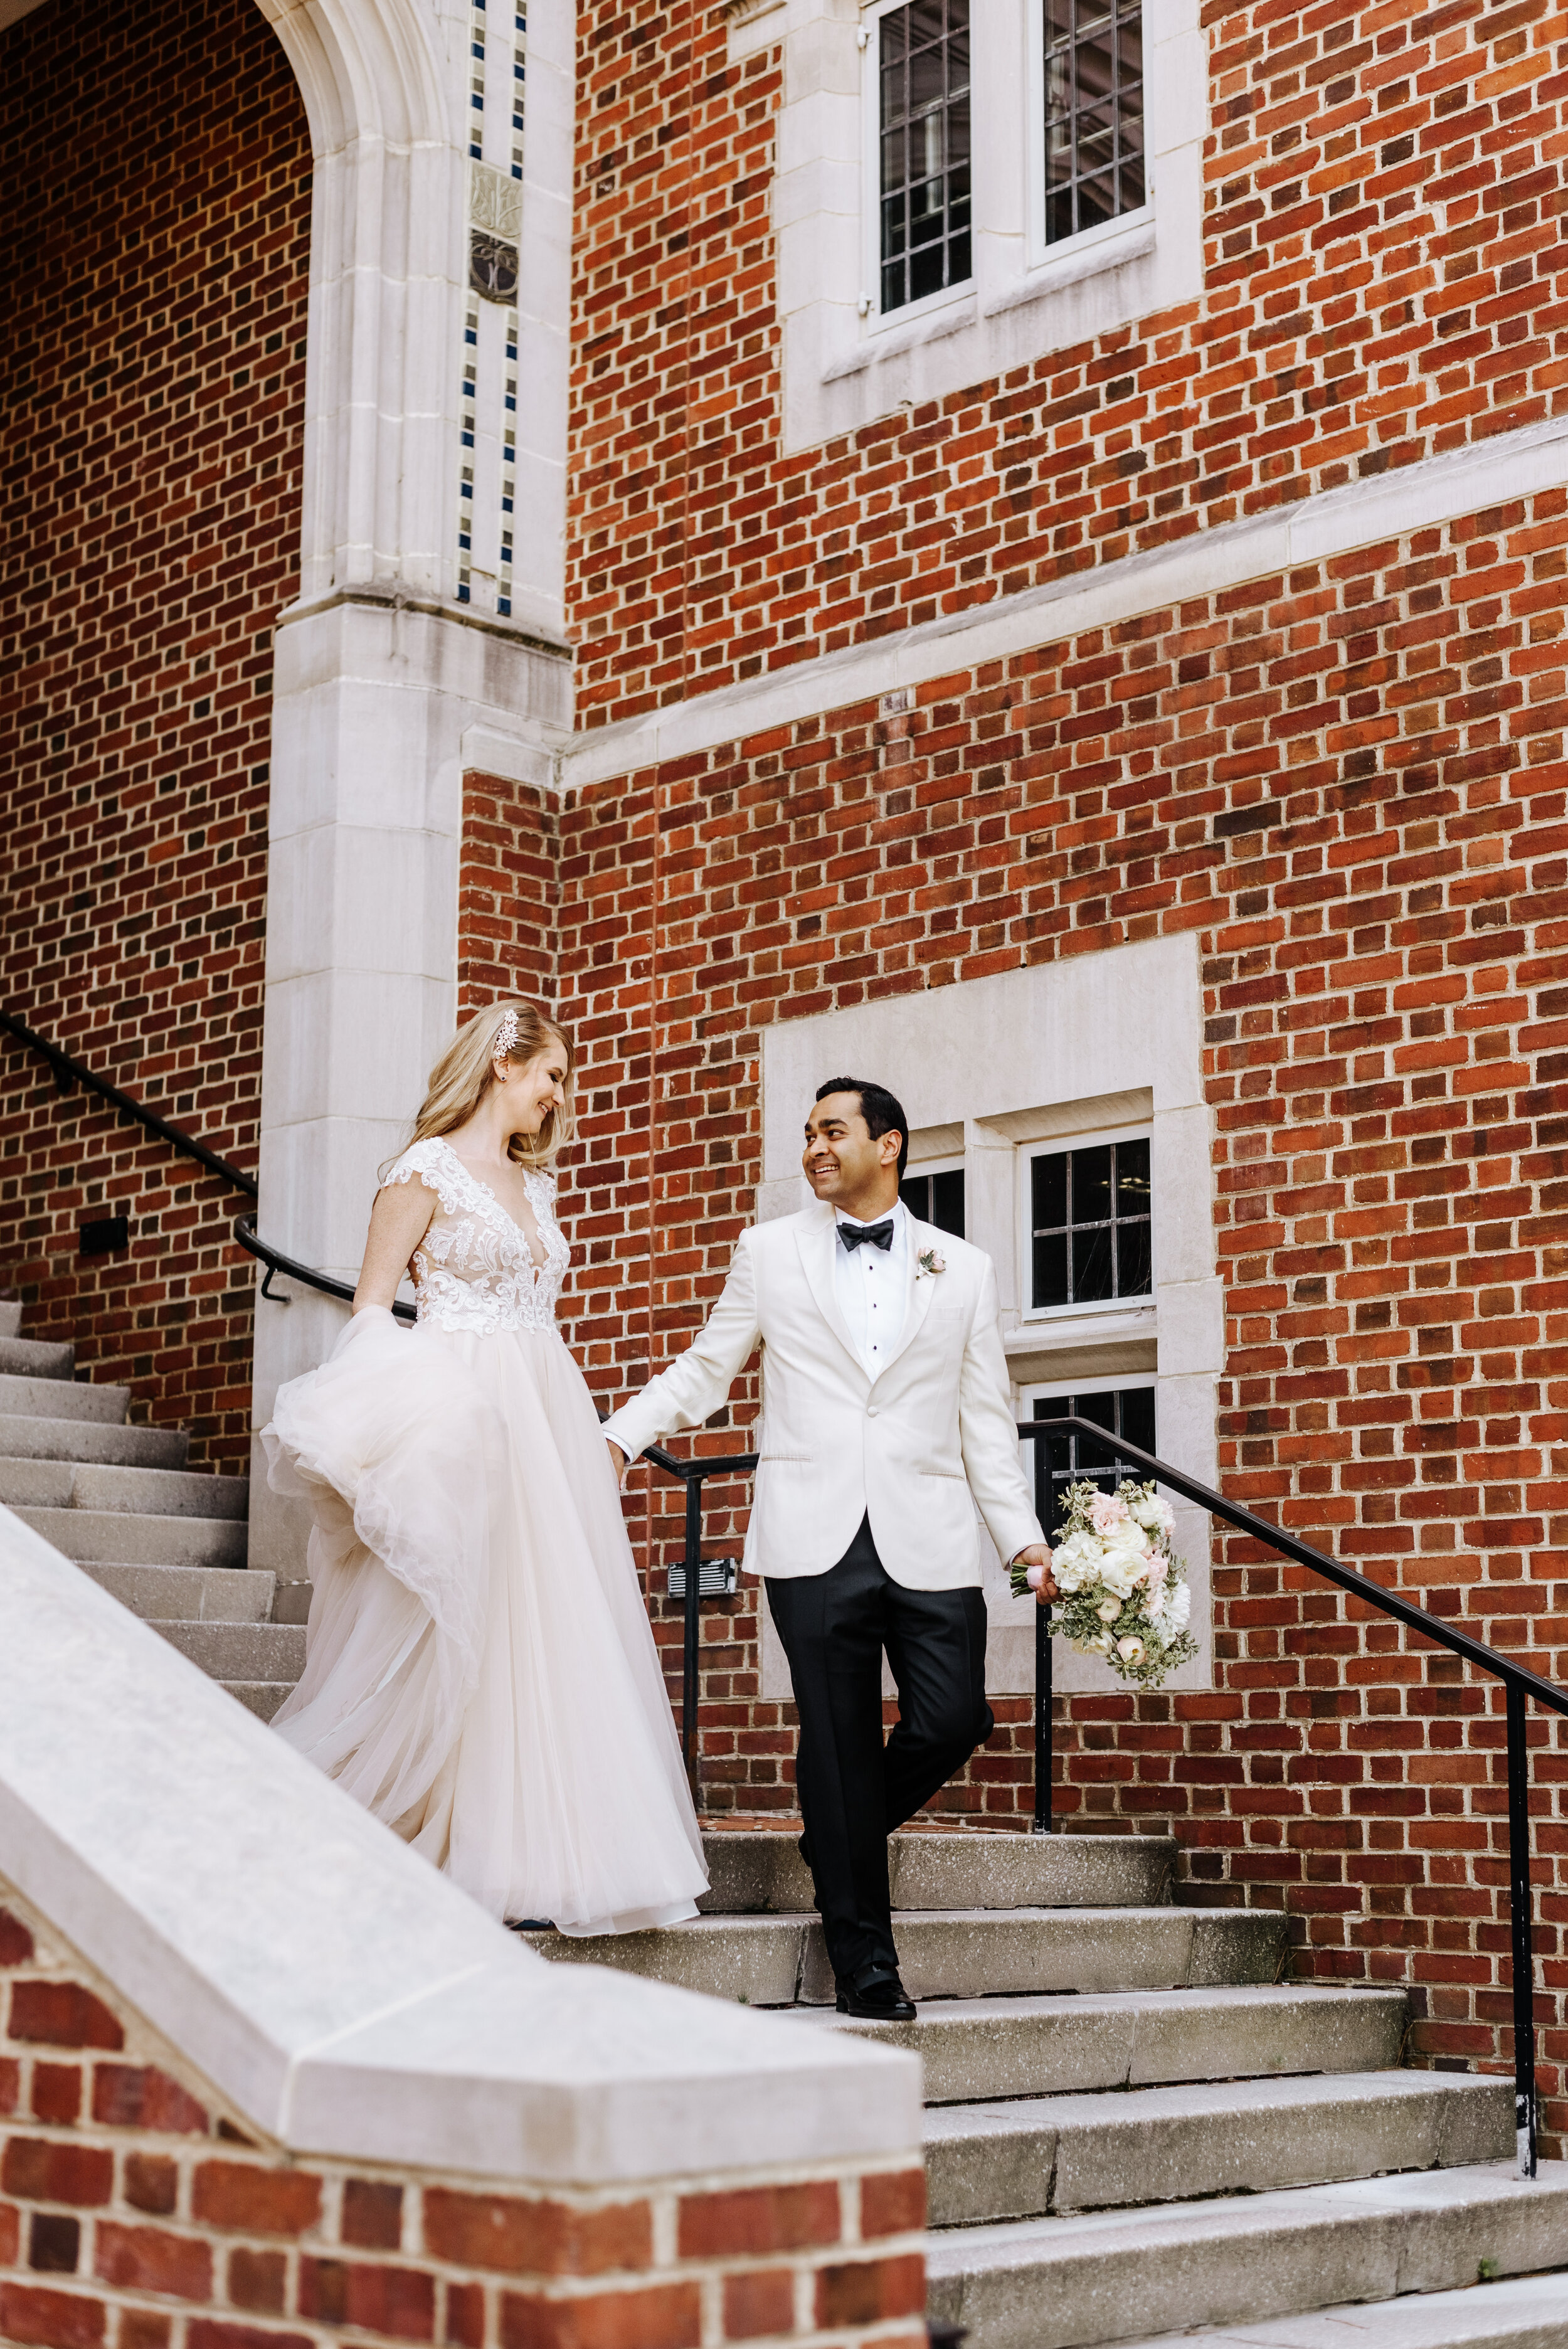 Cassie-Mrunal-Wedding-Quirk-Hotel-John-Marshall-Ballrooms-Richmond-Virginia-Photography-by-V-49.jpg